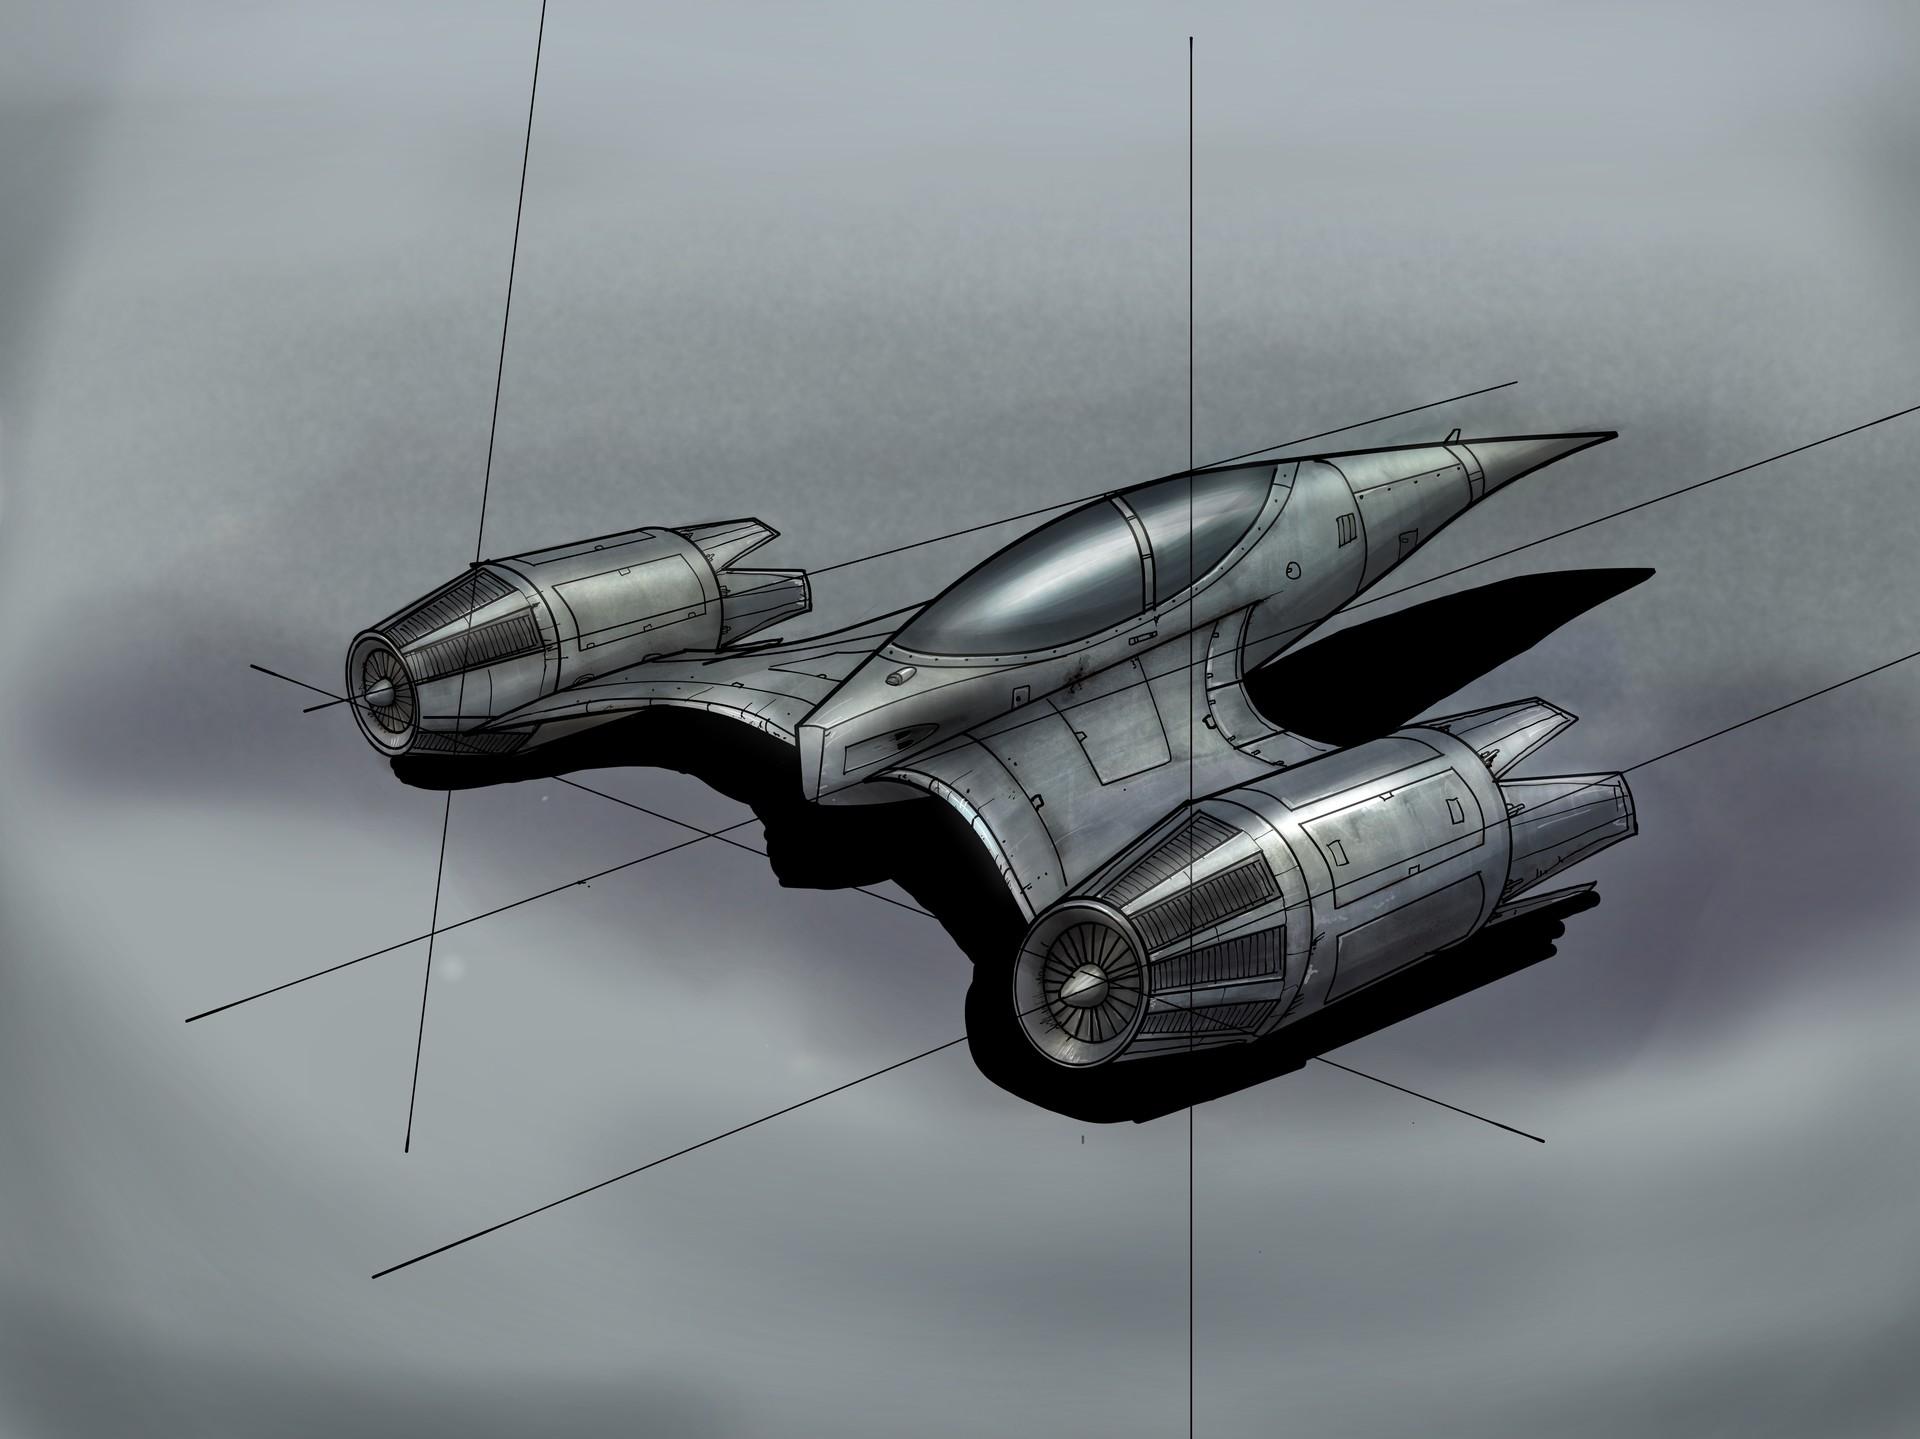 This concept is property of Sharkmob http://sharkmob.com/